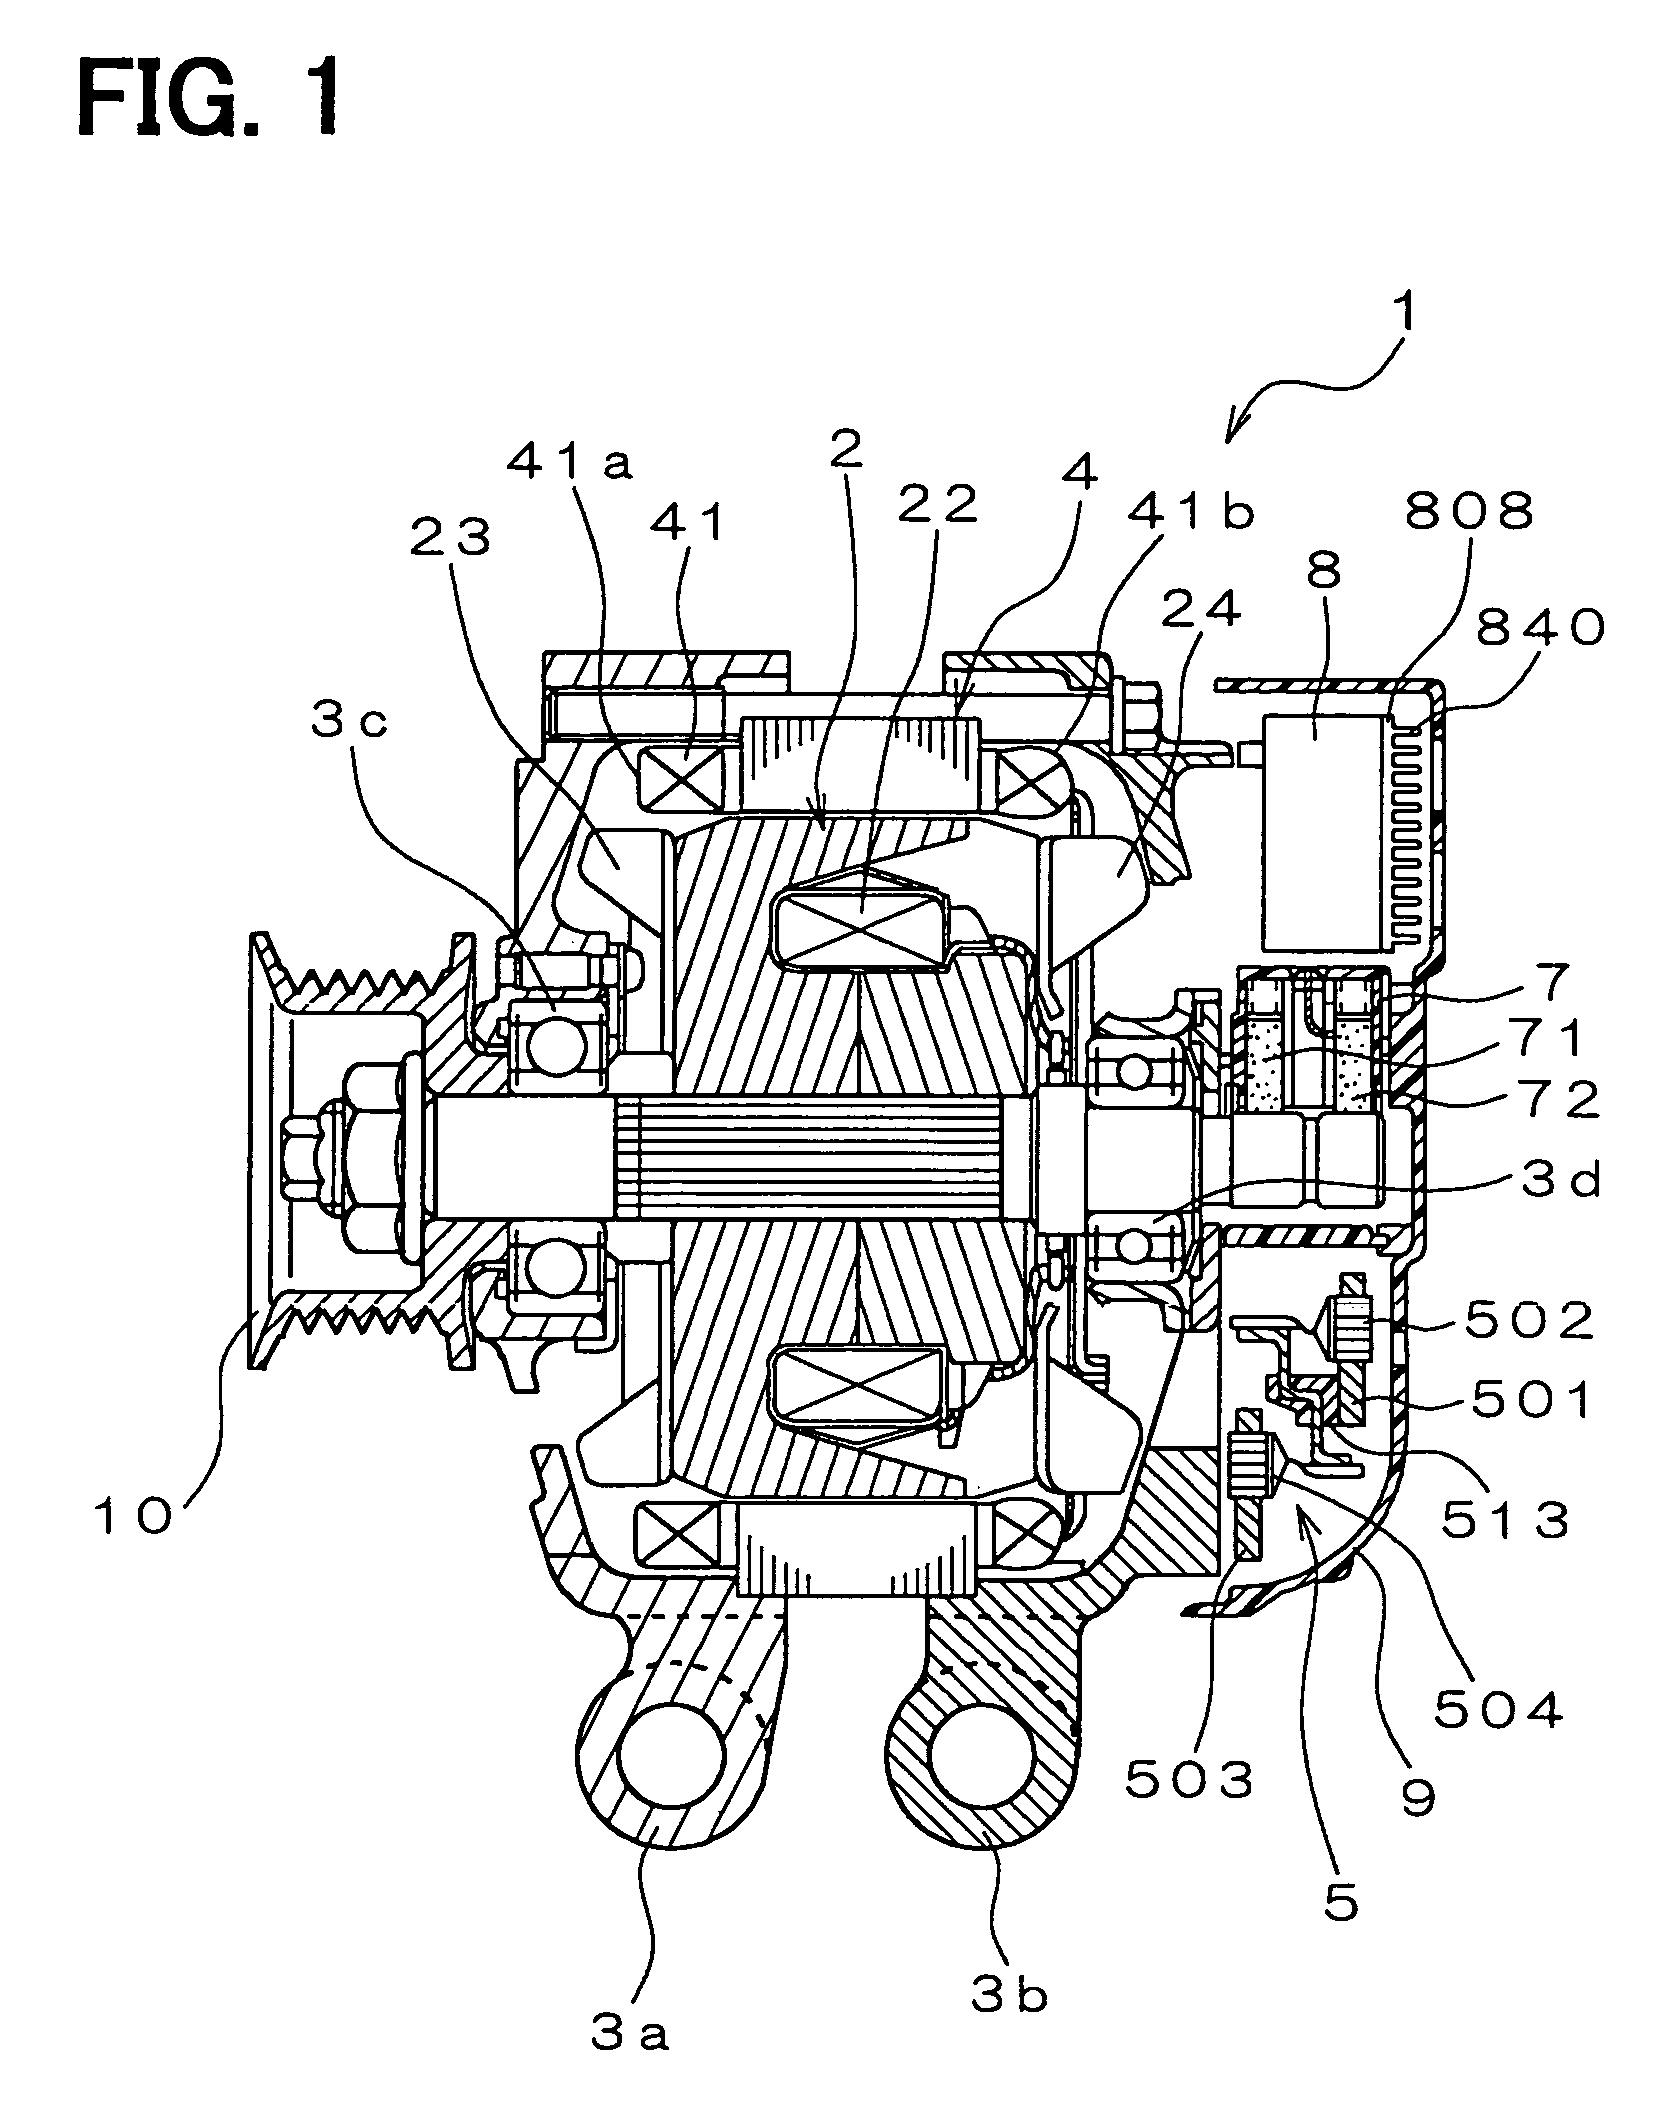 16241 wheel horse garden tractor wire diagram wiring library rh evevo co Reel Mower Wheel Horse Garden Tractor 1972 Wheel Horse Garden Tractor